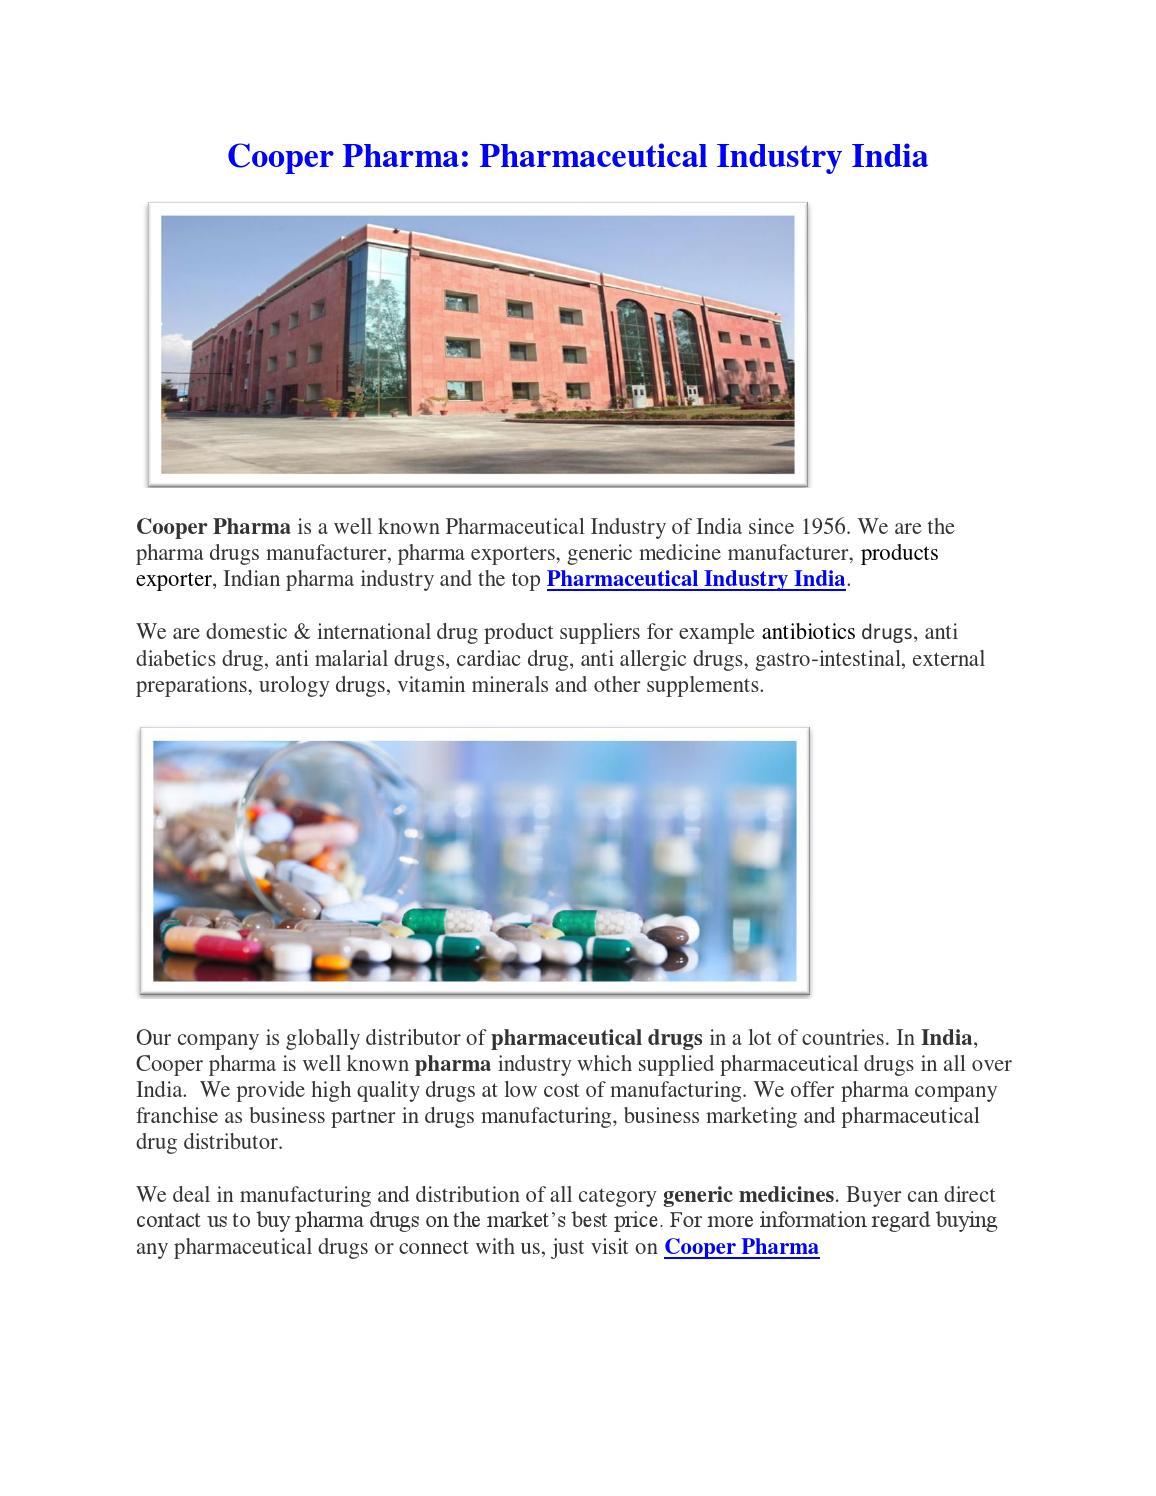 Cooper pharma pharmaceutical industry india